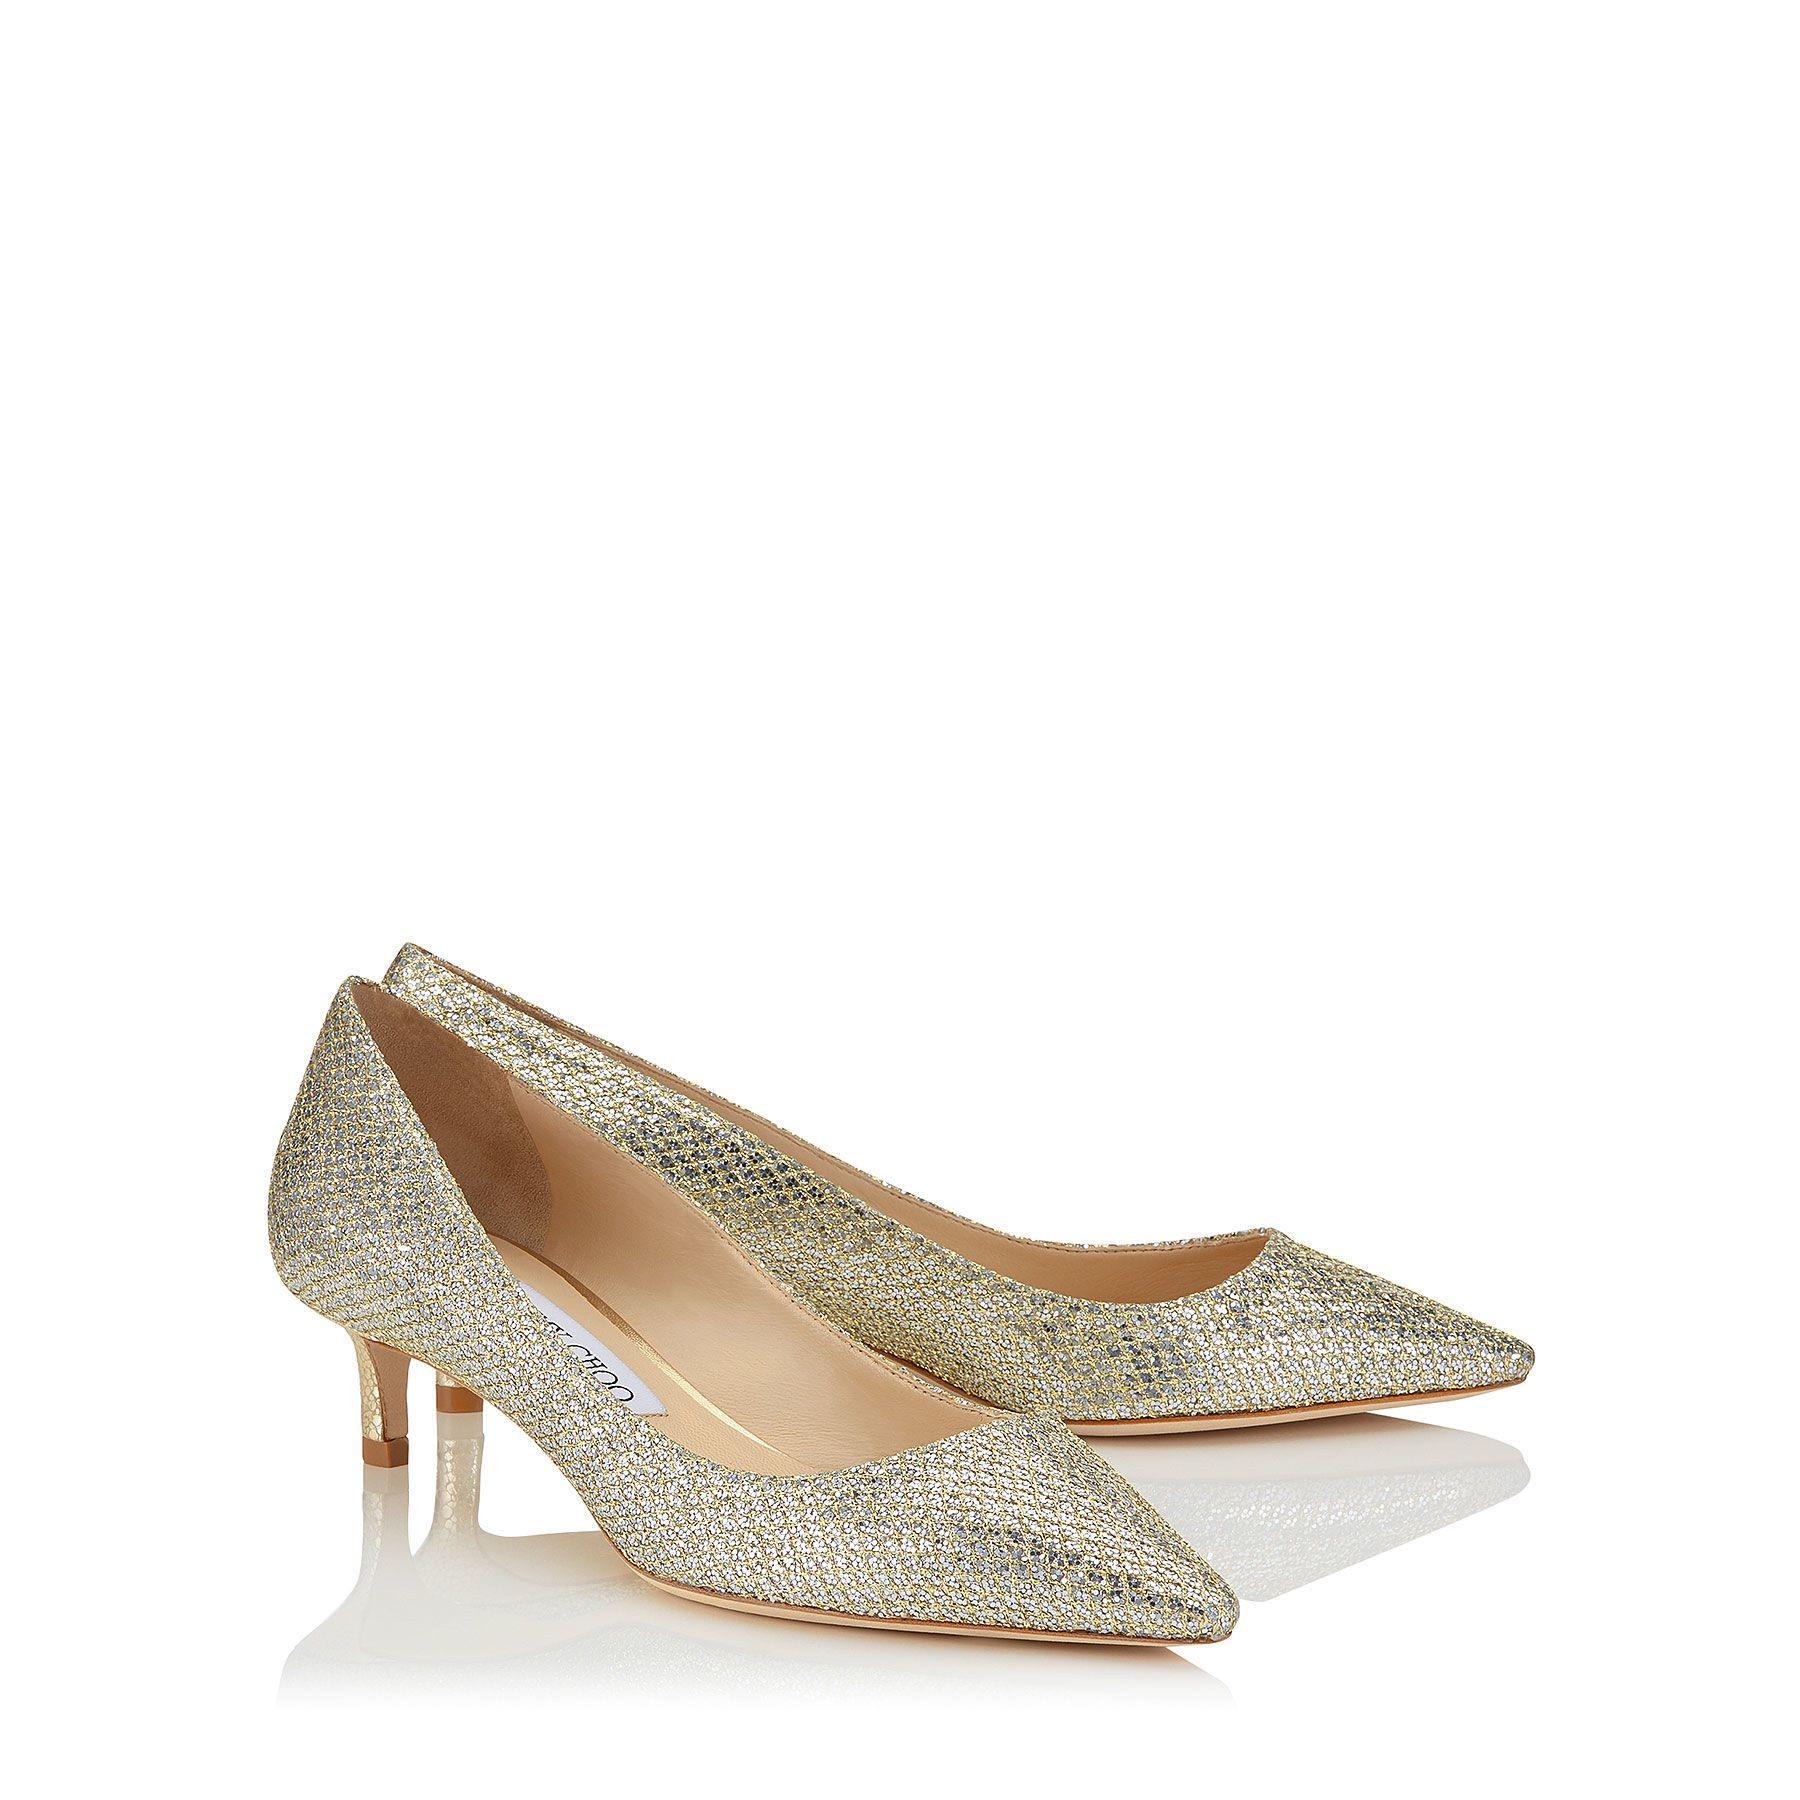 Bridal shoes, Pointy toe pumps, Jimmy choo